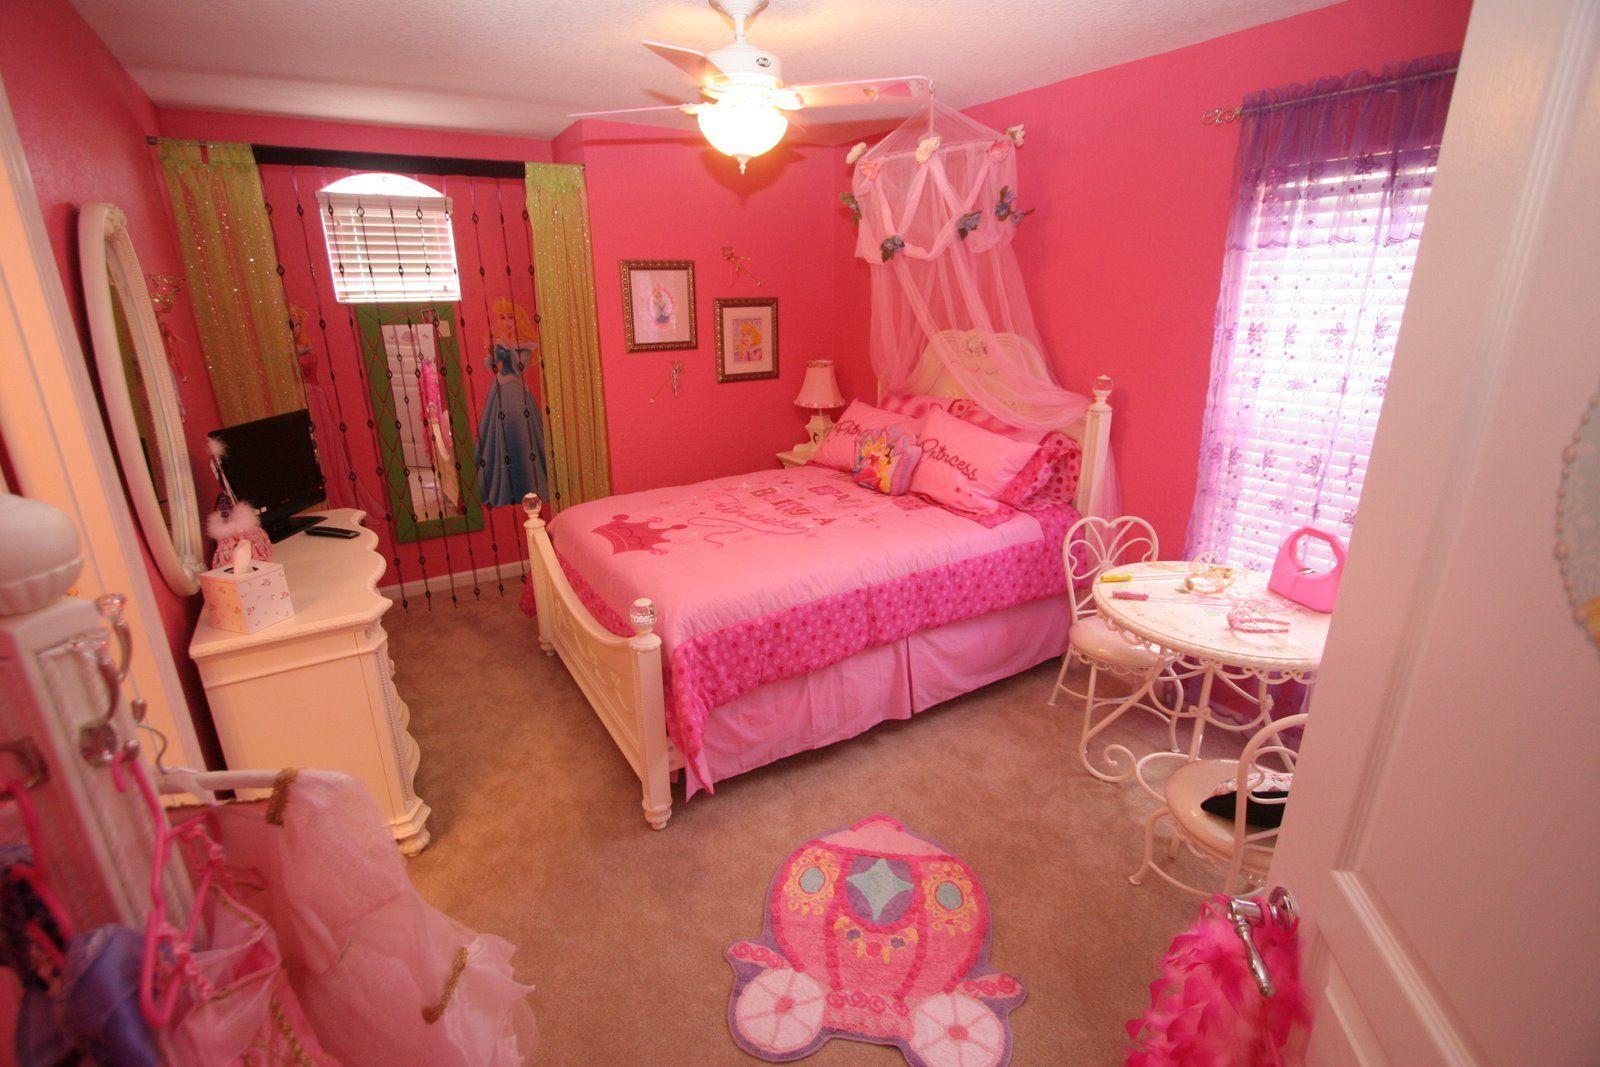 disney princess bedroom furniture set | Training4Green.com ...